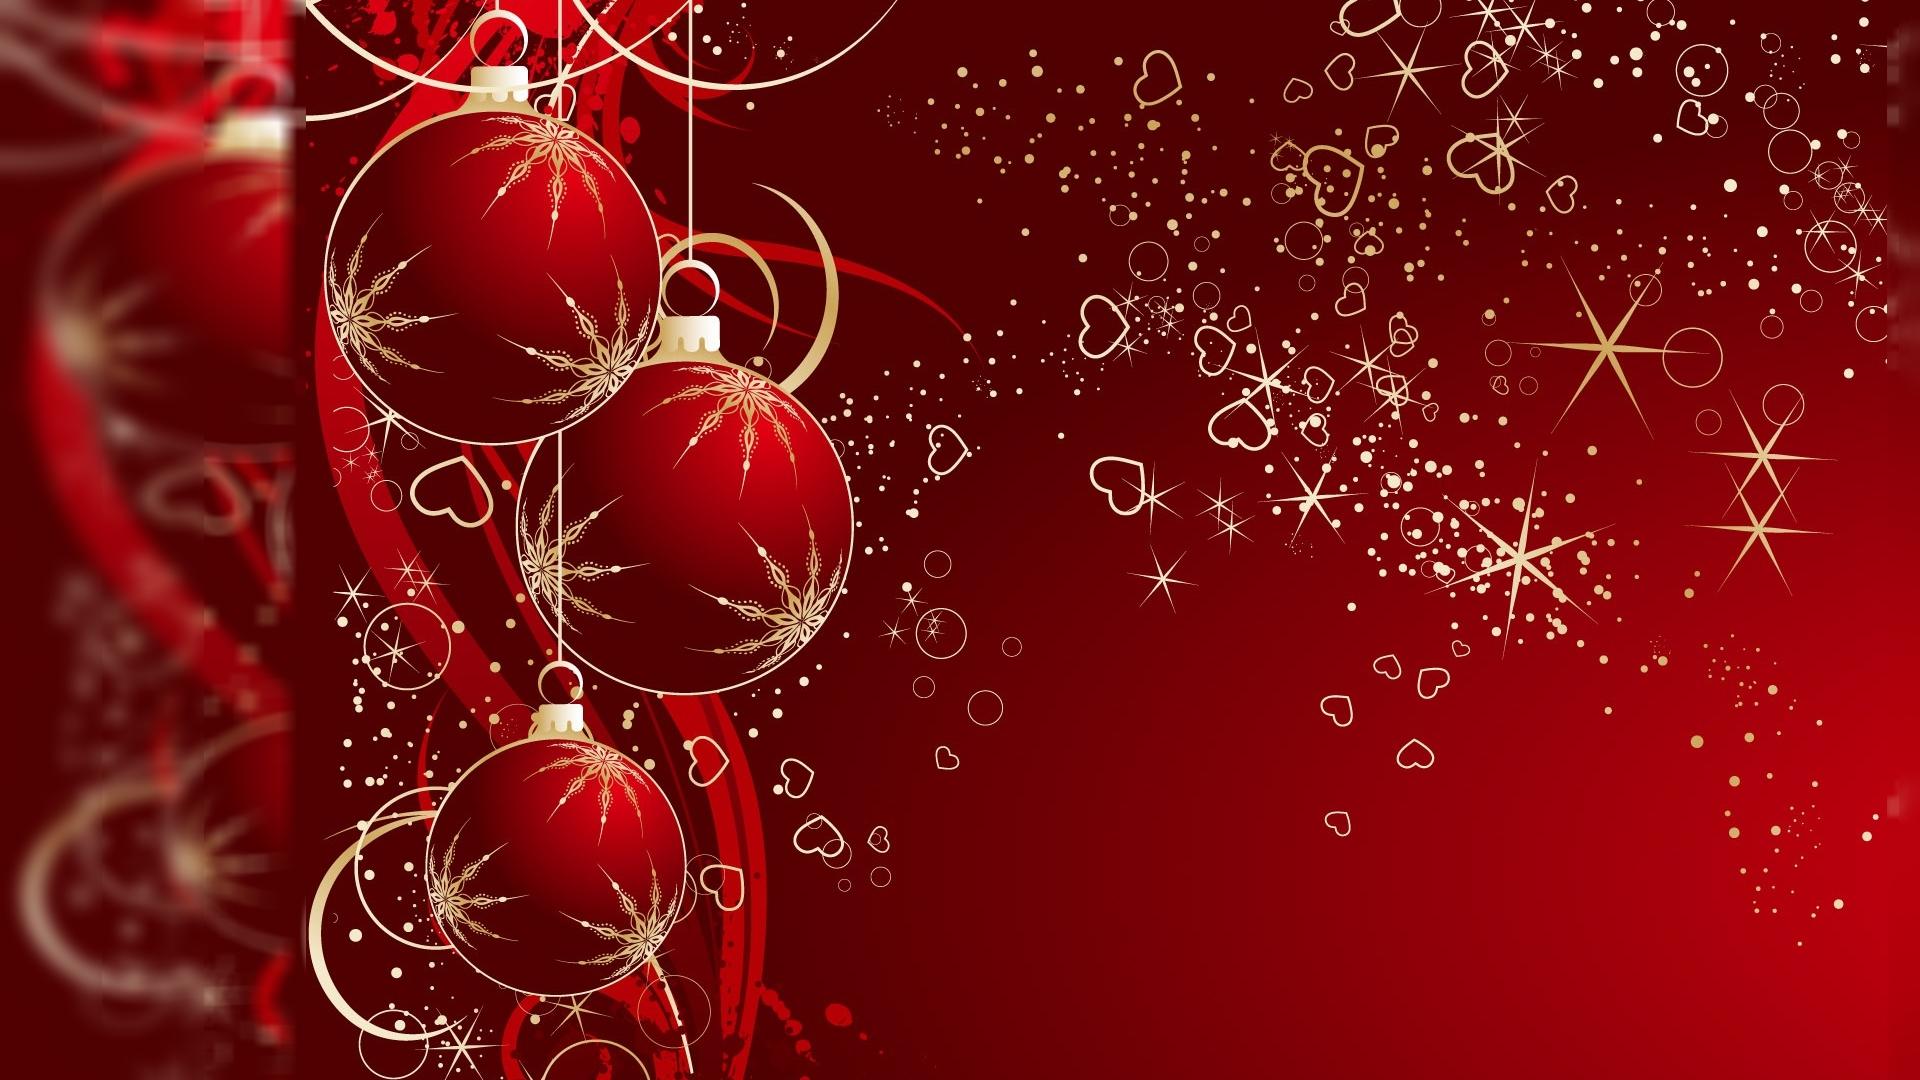 Hd christmas wallpaper 1920x1080 wallpapersafari - Christmas wallpaper hd for desktop ...